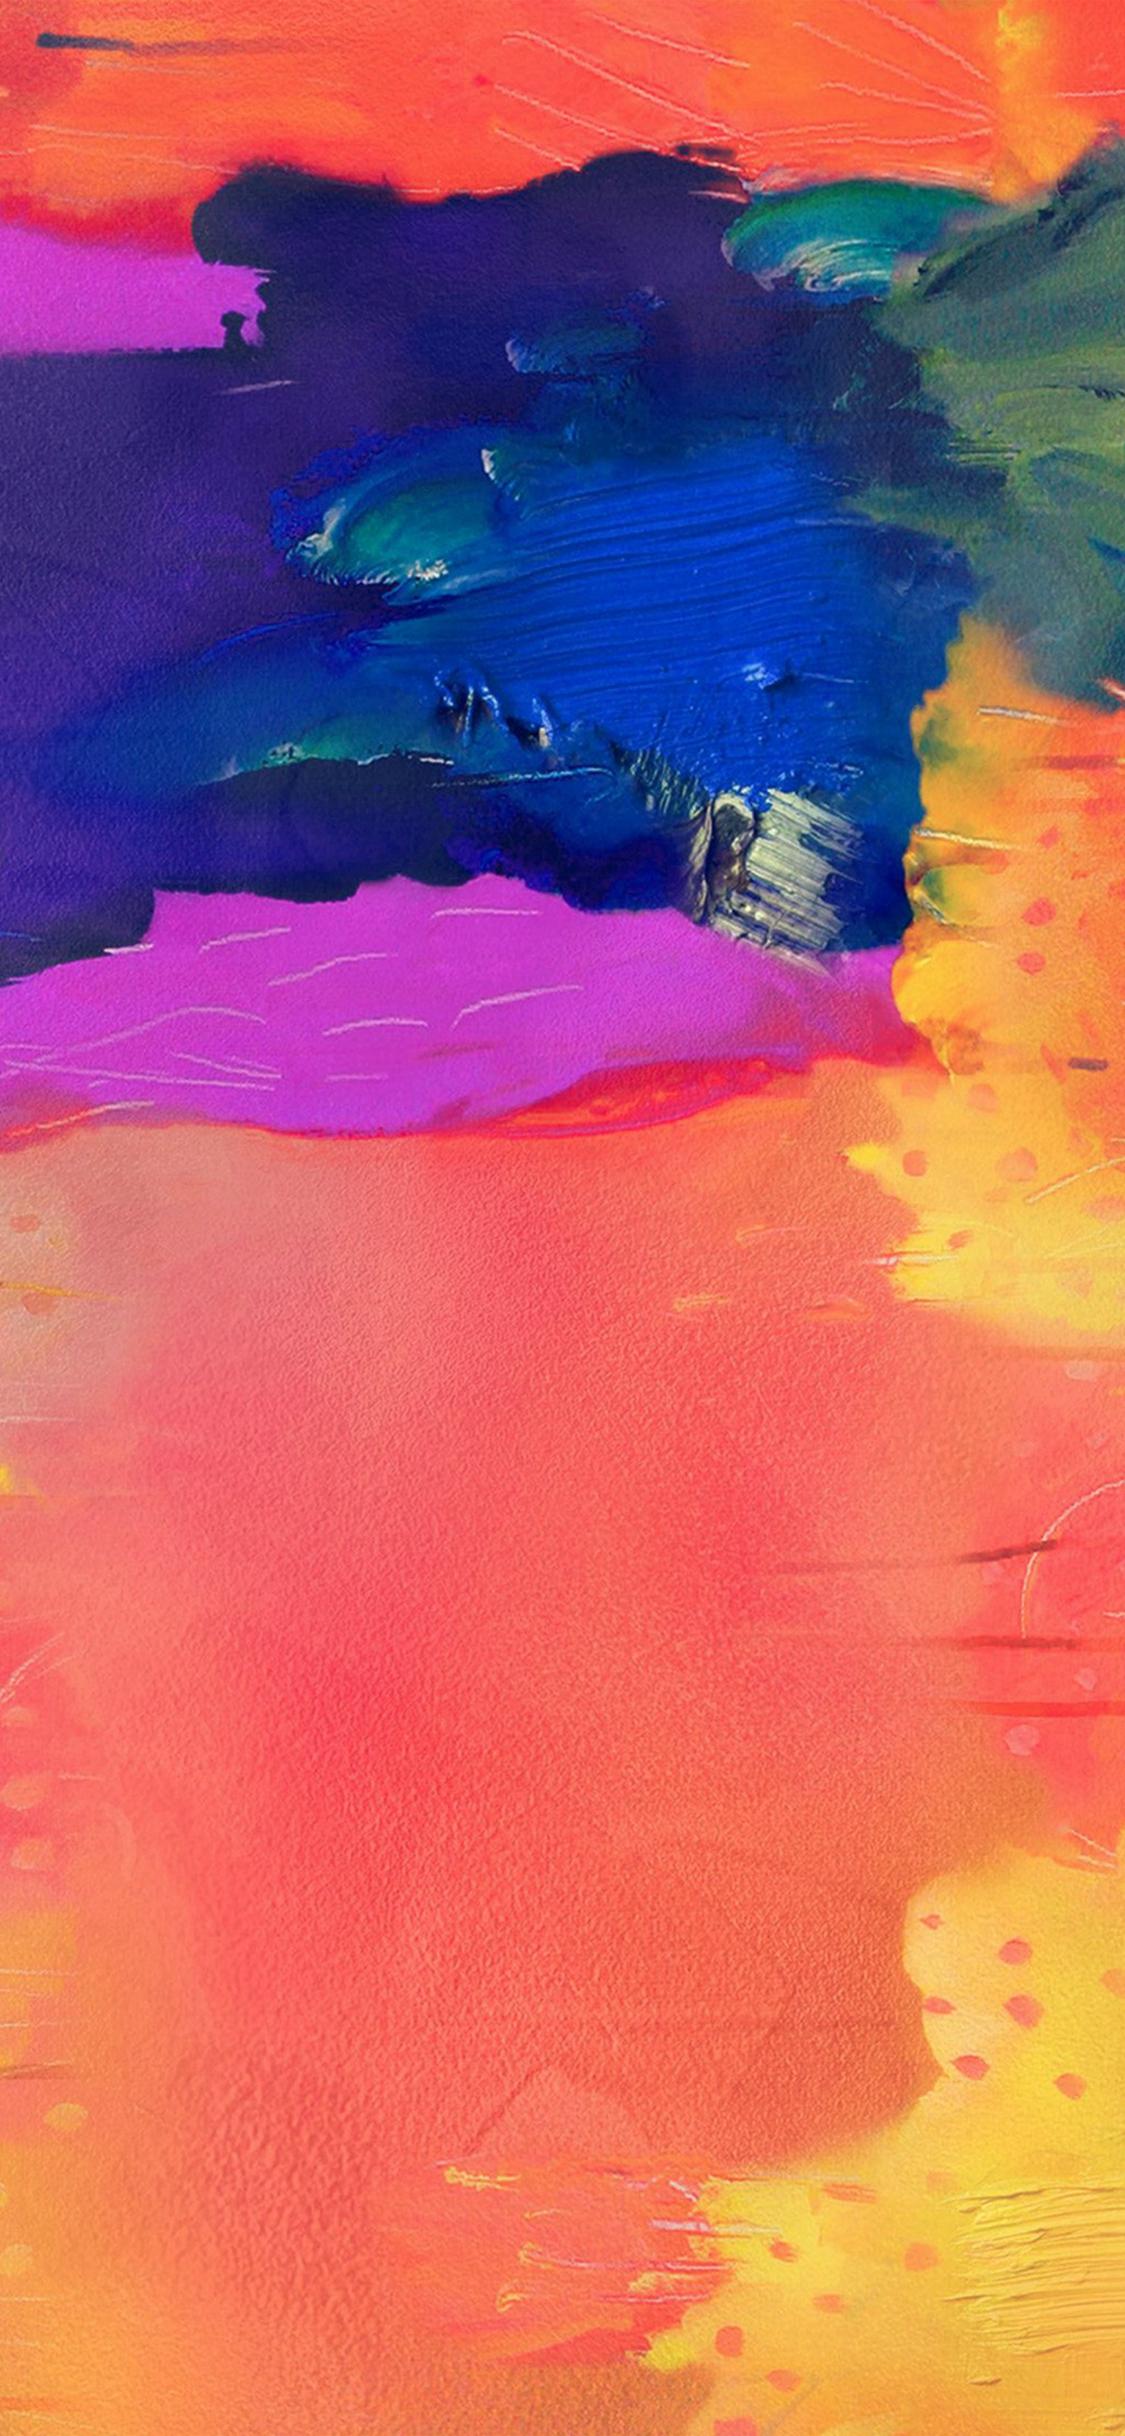 Note Pro Galaxy Painting Art Pattern Rainbow iPhone X wallpaper